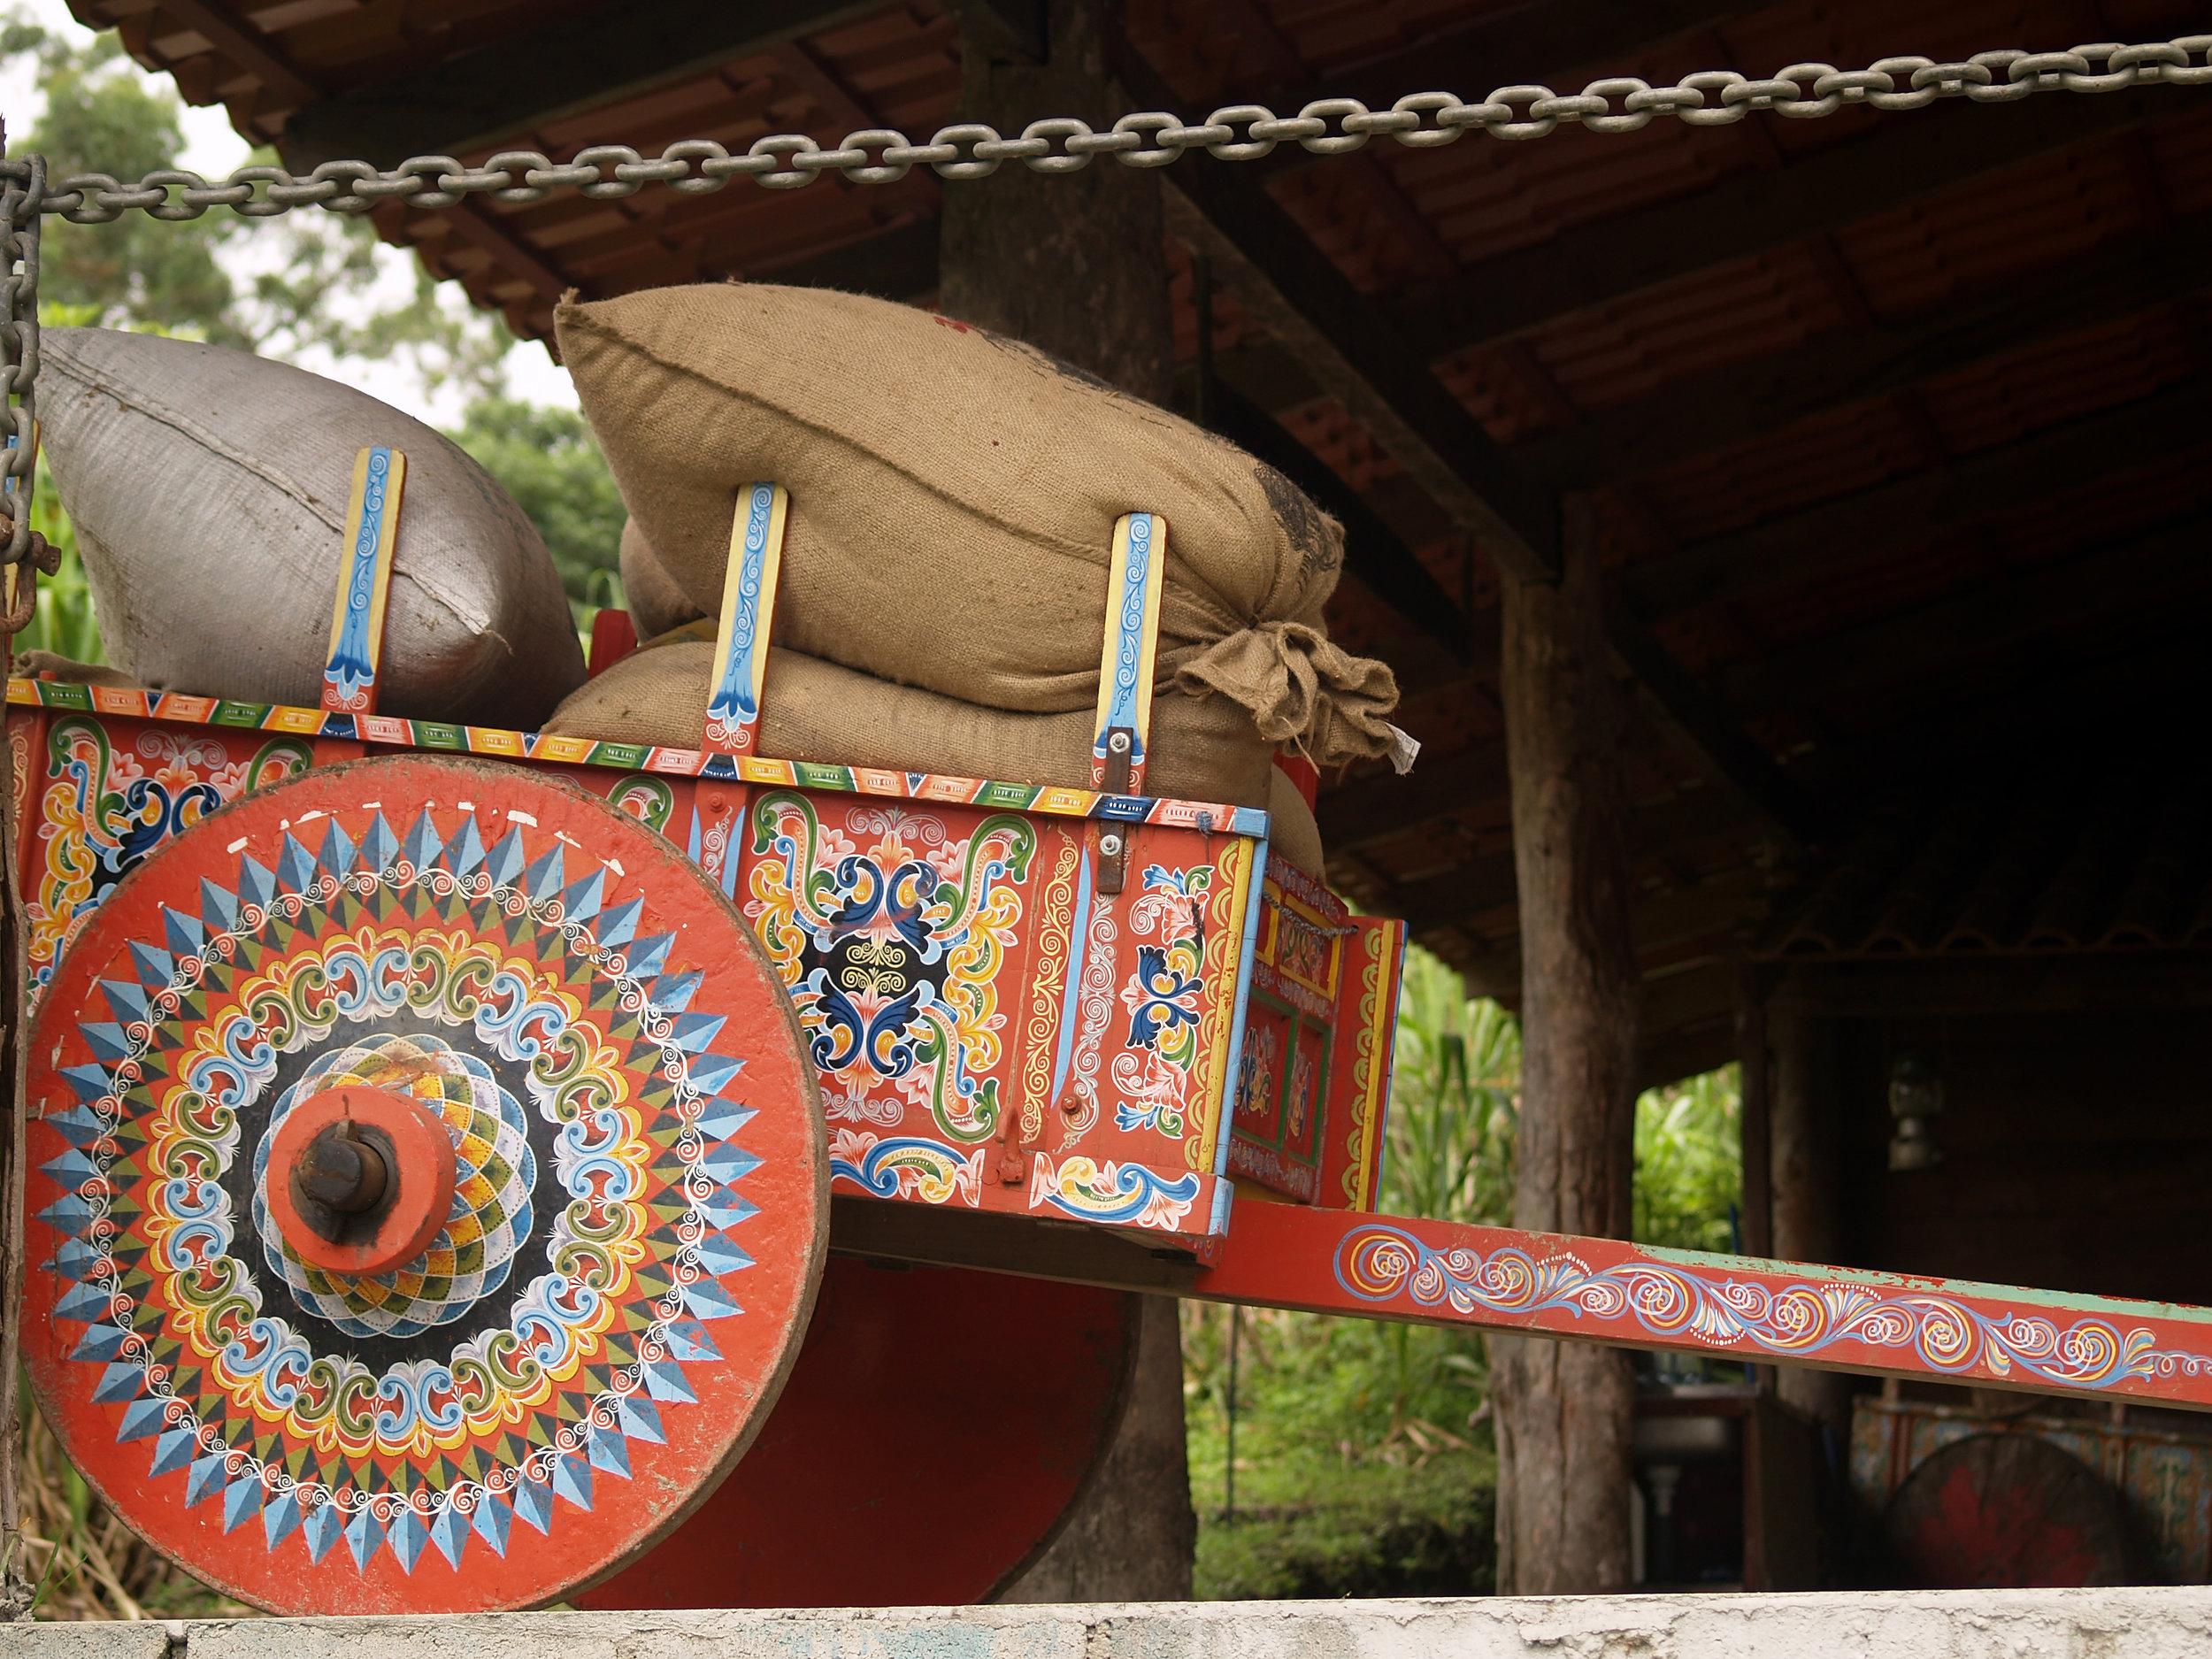 bigstock-Costa-Rican-Ox-Cart-Loaded-Wit-24677963.jpg